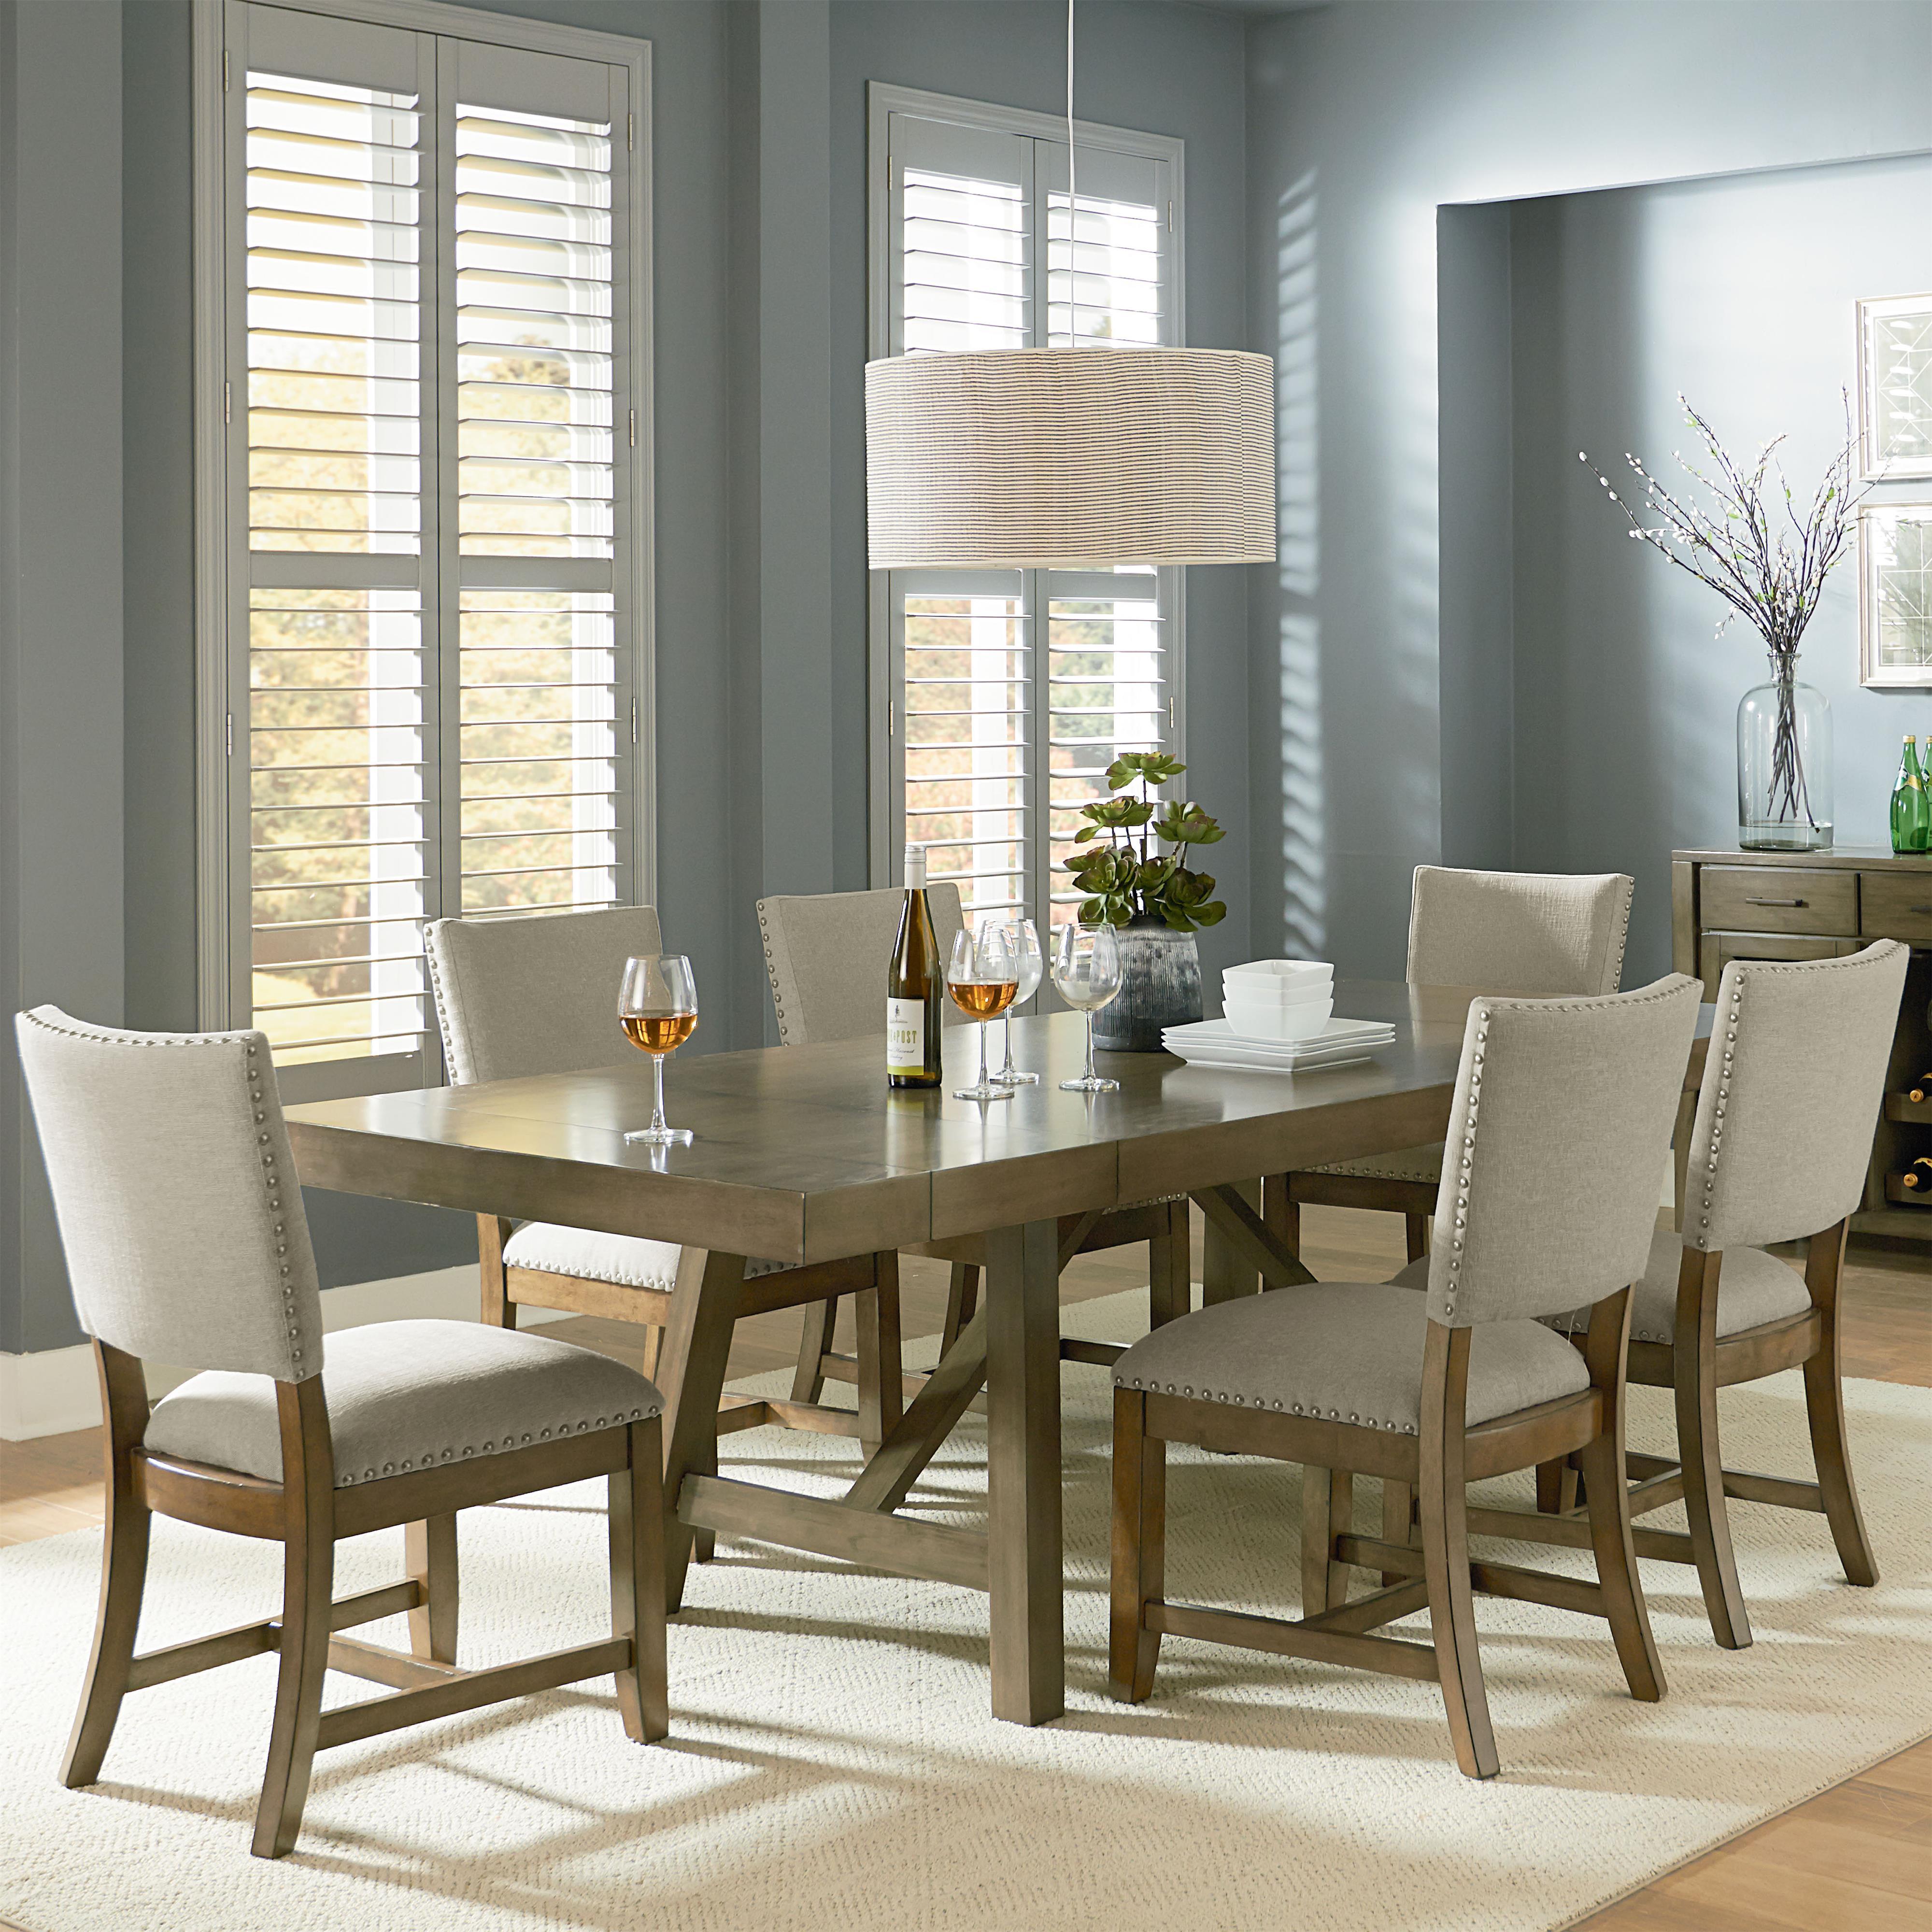 Standard Furniture Omaha Grey Trestle Table Dining Set - Item Number: 16681+6x87